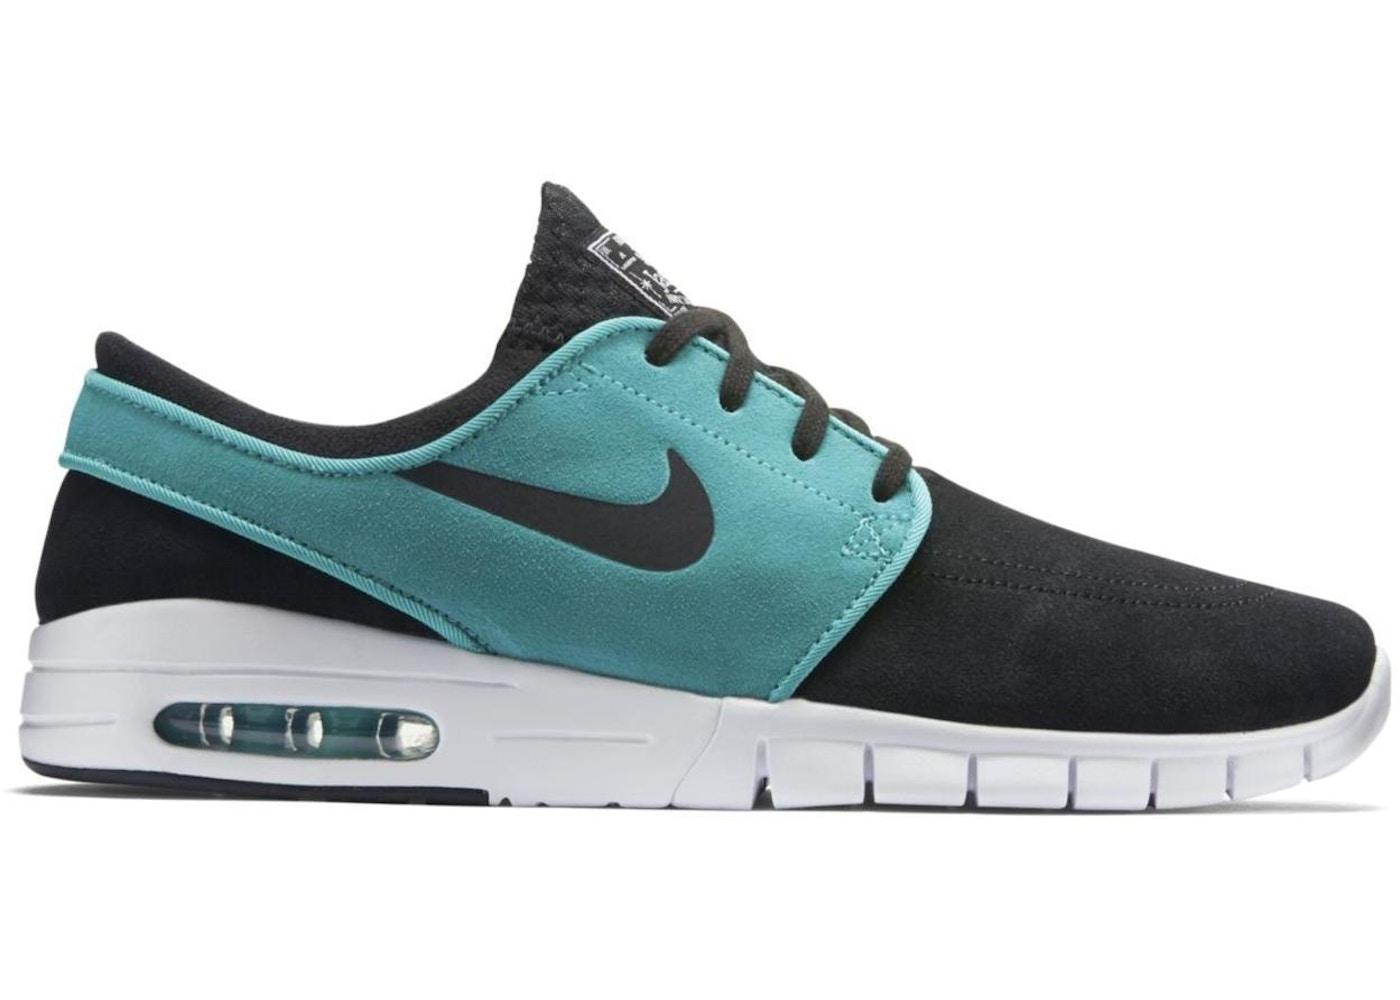 Nike SB Stefan Janoski Max Leather Black Mint Retro - 685299-031 f4c1a2f0620e